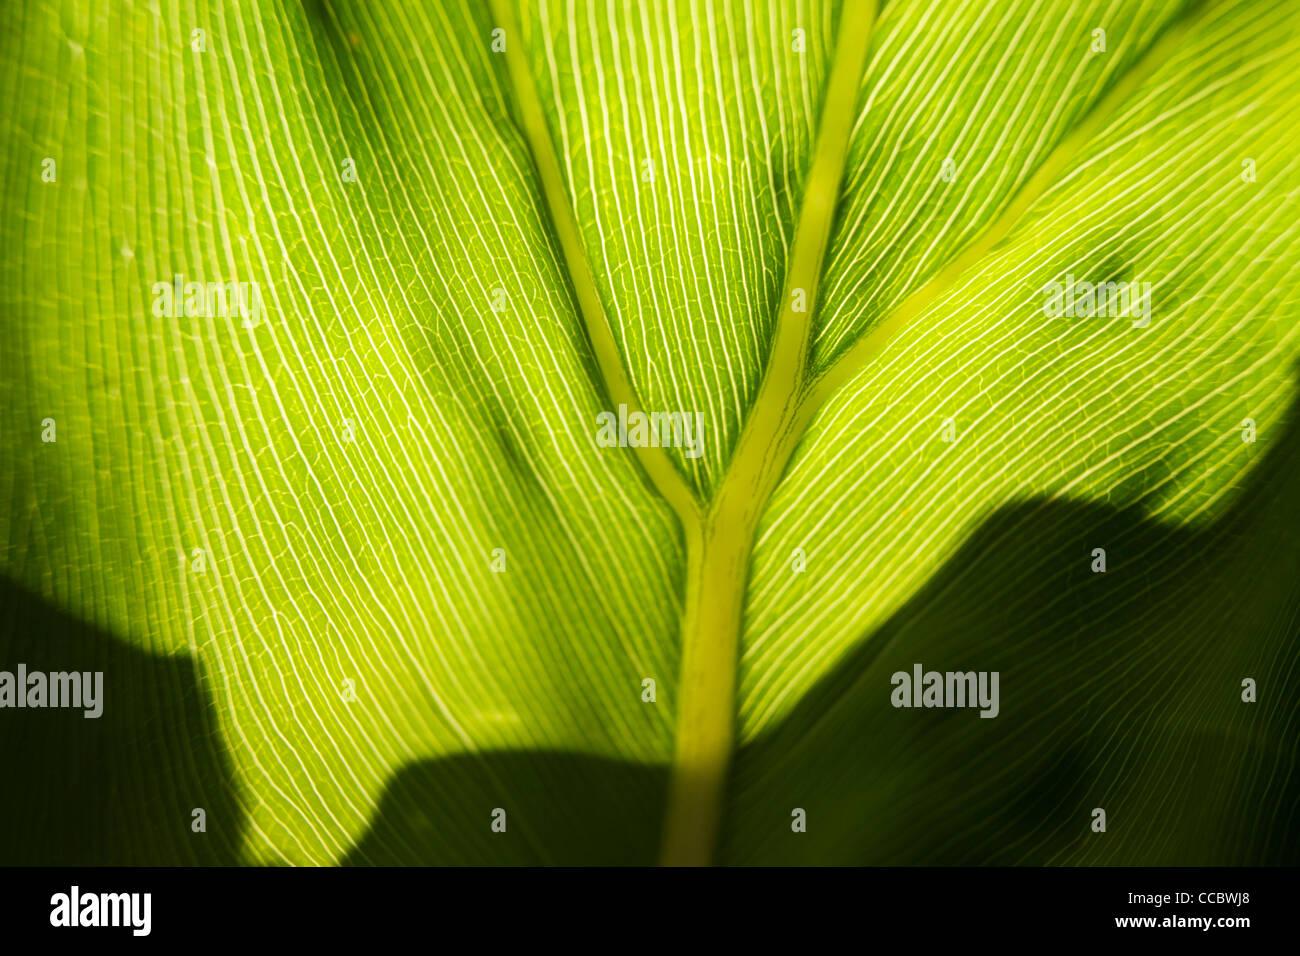 Leaf, close-up - Stock Image